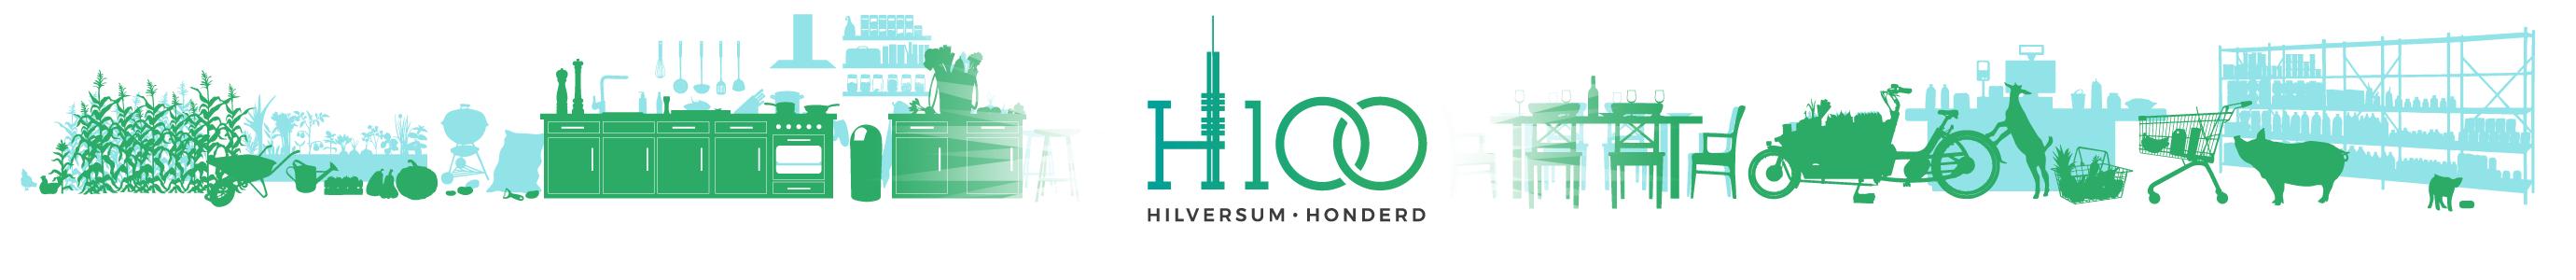 Hilversum 100  - 100% duurzaam in 2050